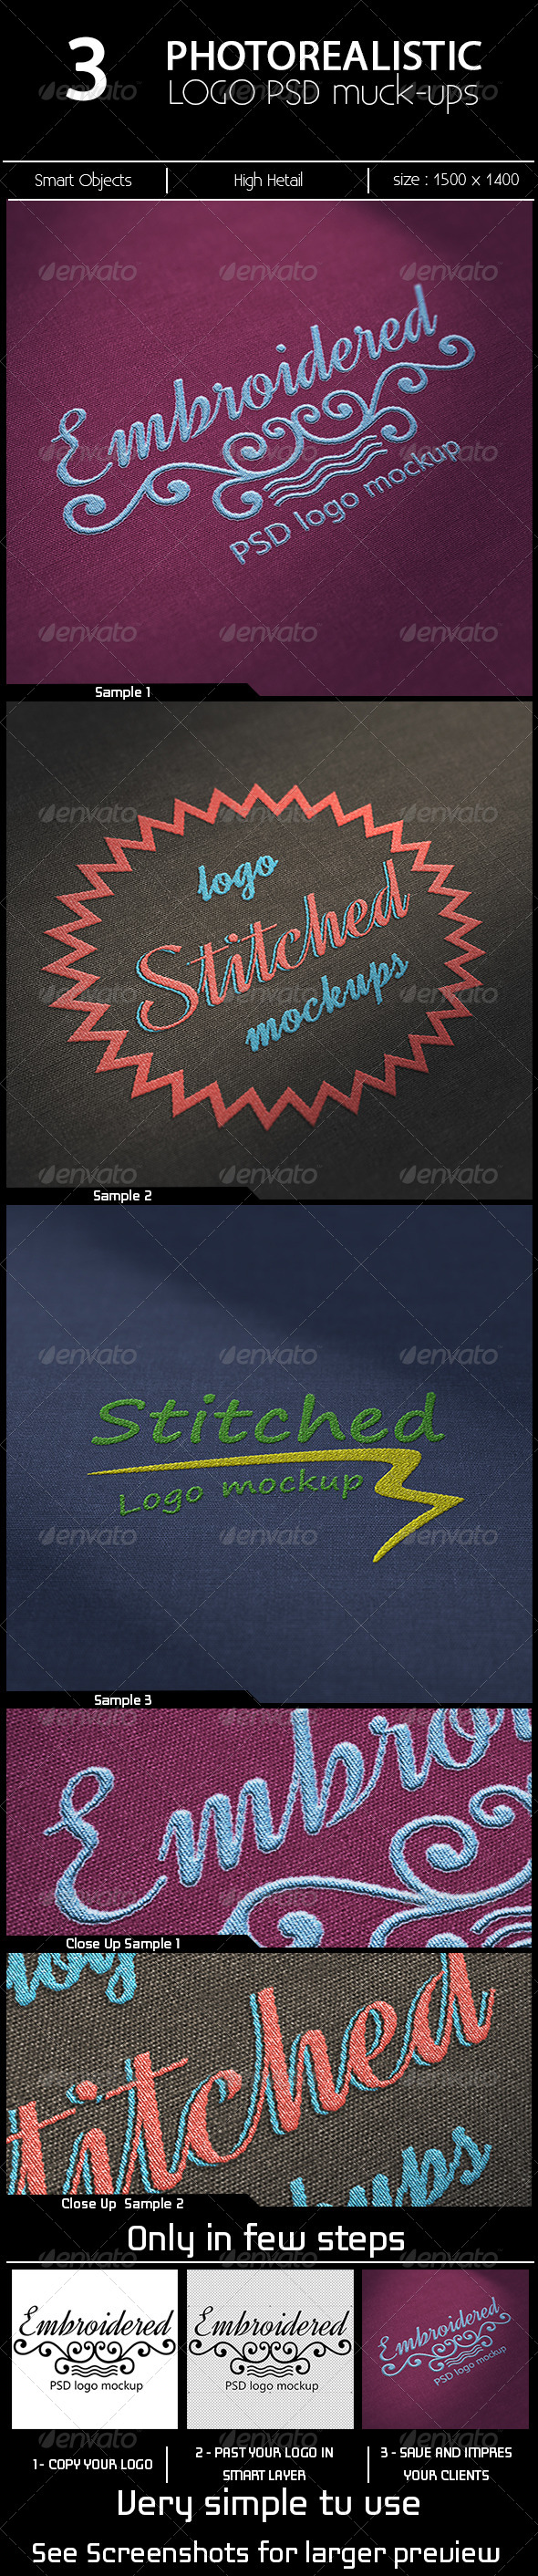 GraphicRiver 3 Photorealistic Logo Mock-ups 6885481